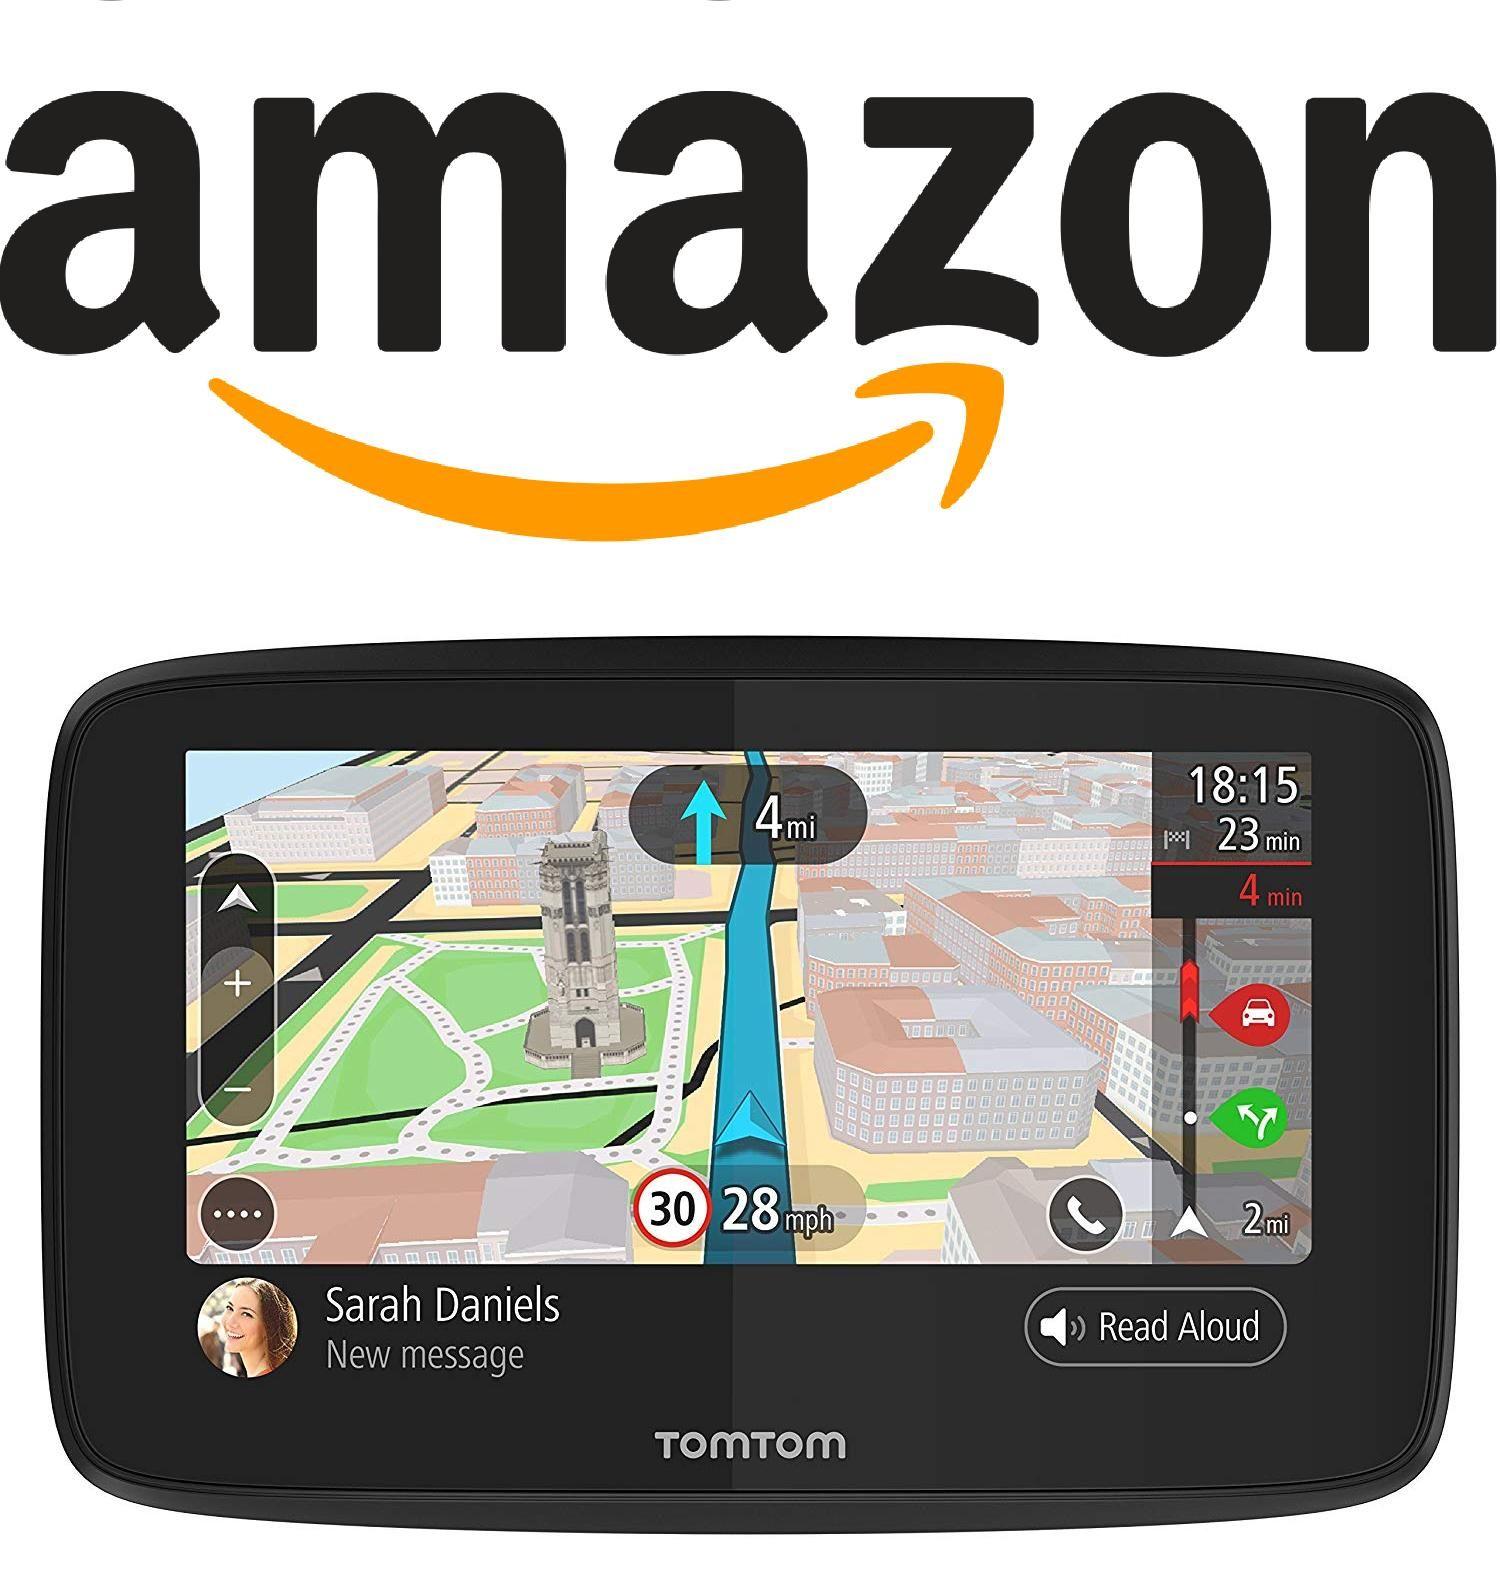 TomTom 5 Inch Car Sat Nav GO 520 with updates via WiFi ... on sat prep book, sat score chart 2014, sat cartoon,